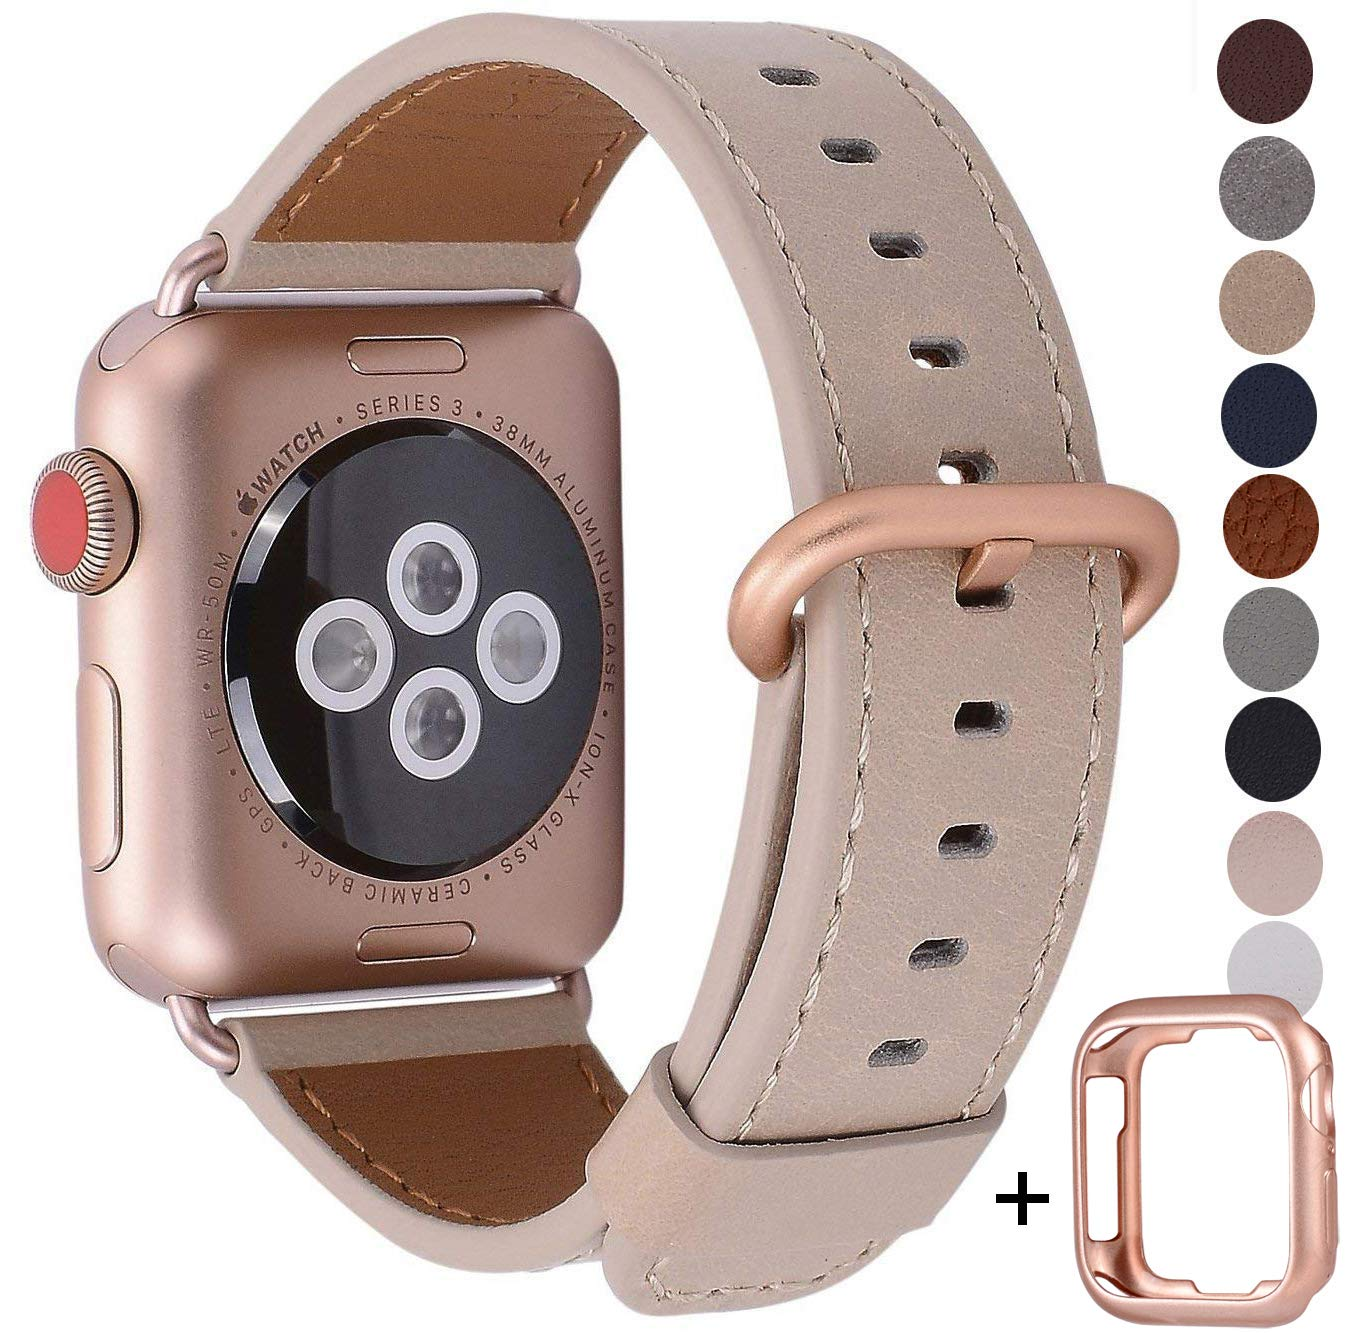 jsgjmy Apple Watchバンド38 mm 42 mmレディースメンズレザーループ交換リストiWatchストラップfor Apple Watchシリーズ3ゴールド 42 mm JSGJMY-20180122-A1 B0796Q6R3L Series 3 Gold Buckle+Ivory leather 42 mm